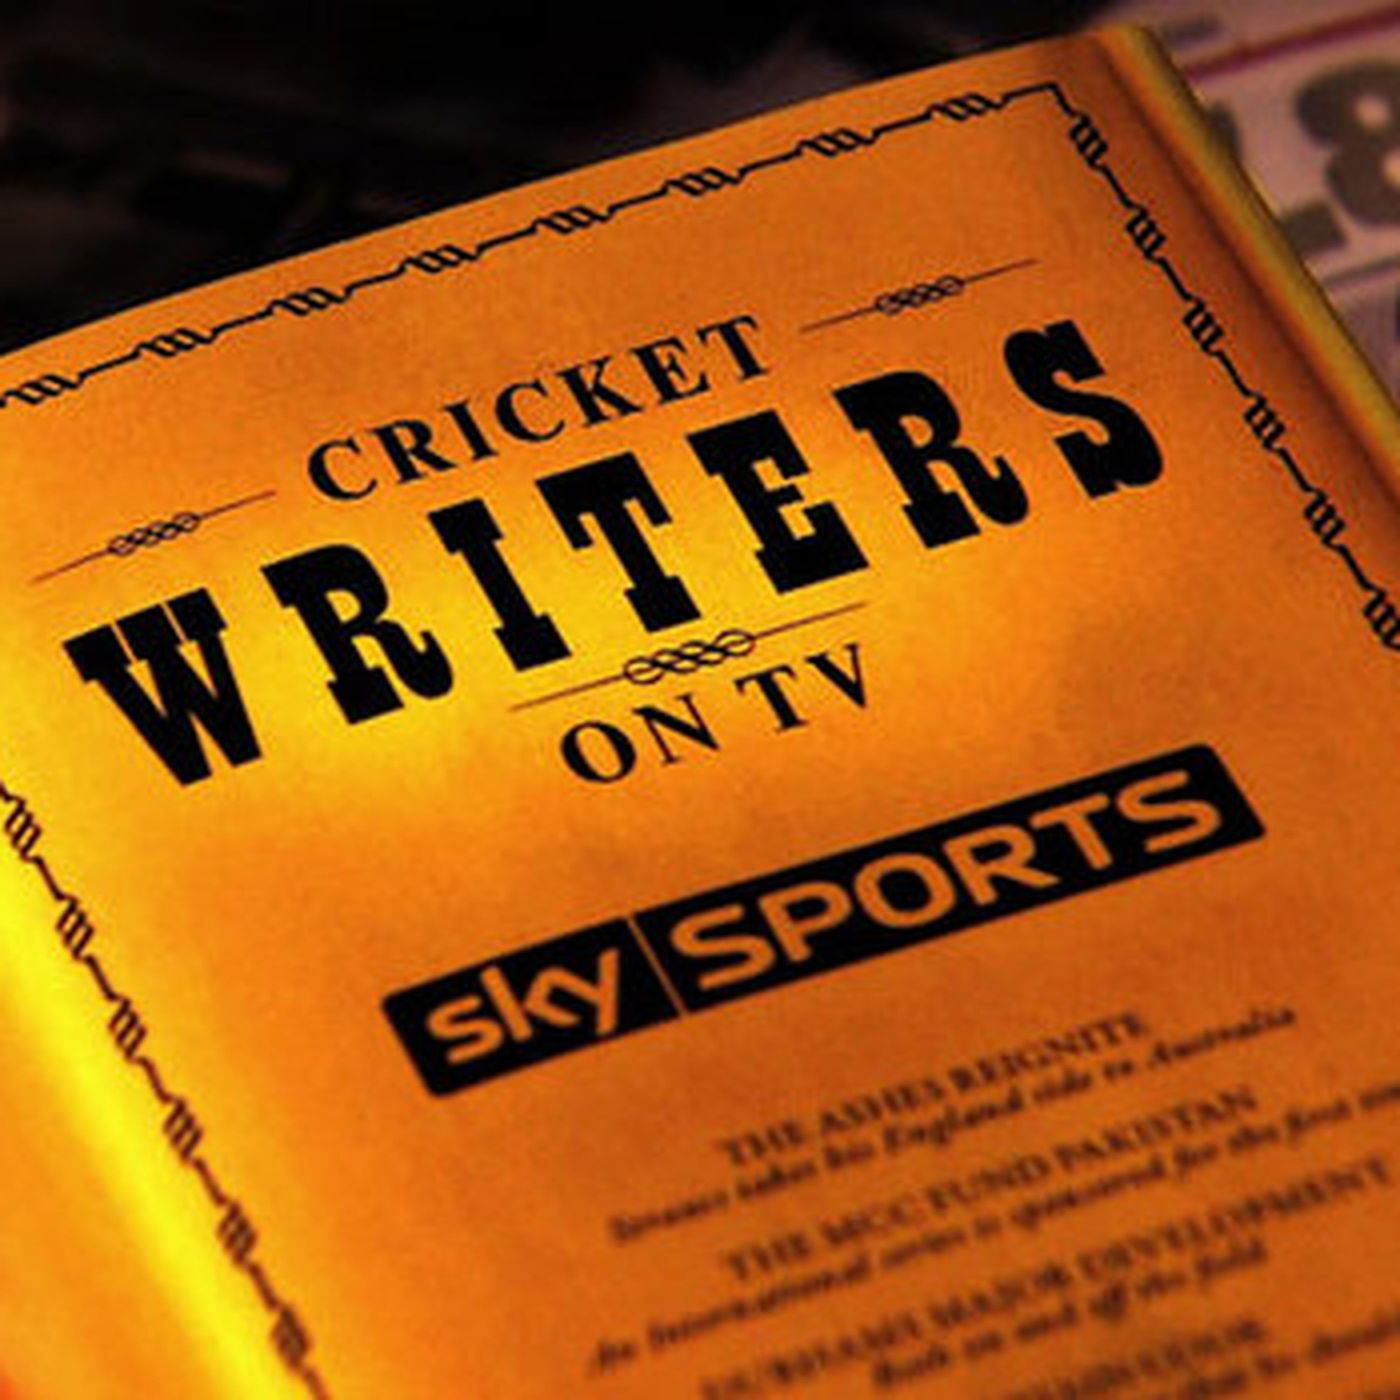 Cricket Writers on TV - July 23